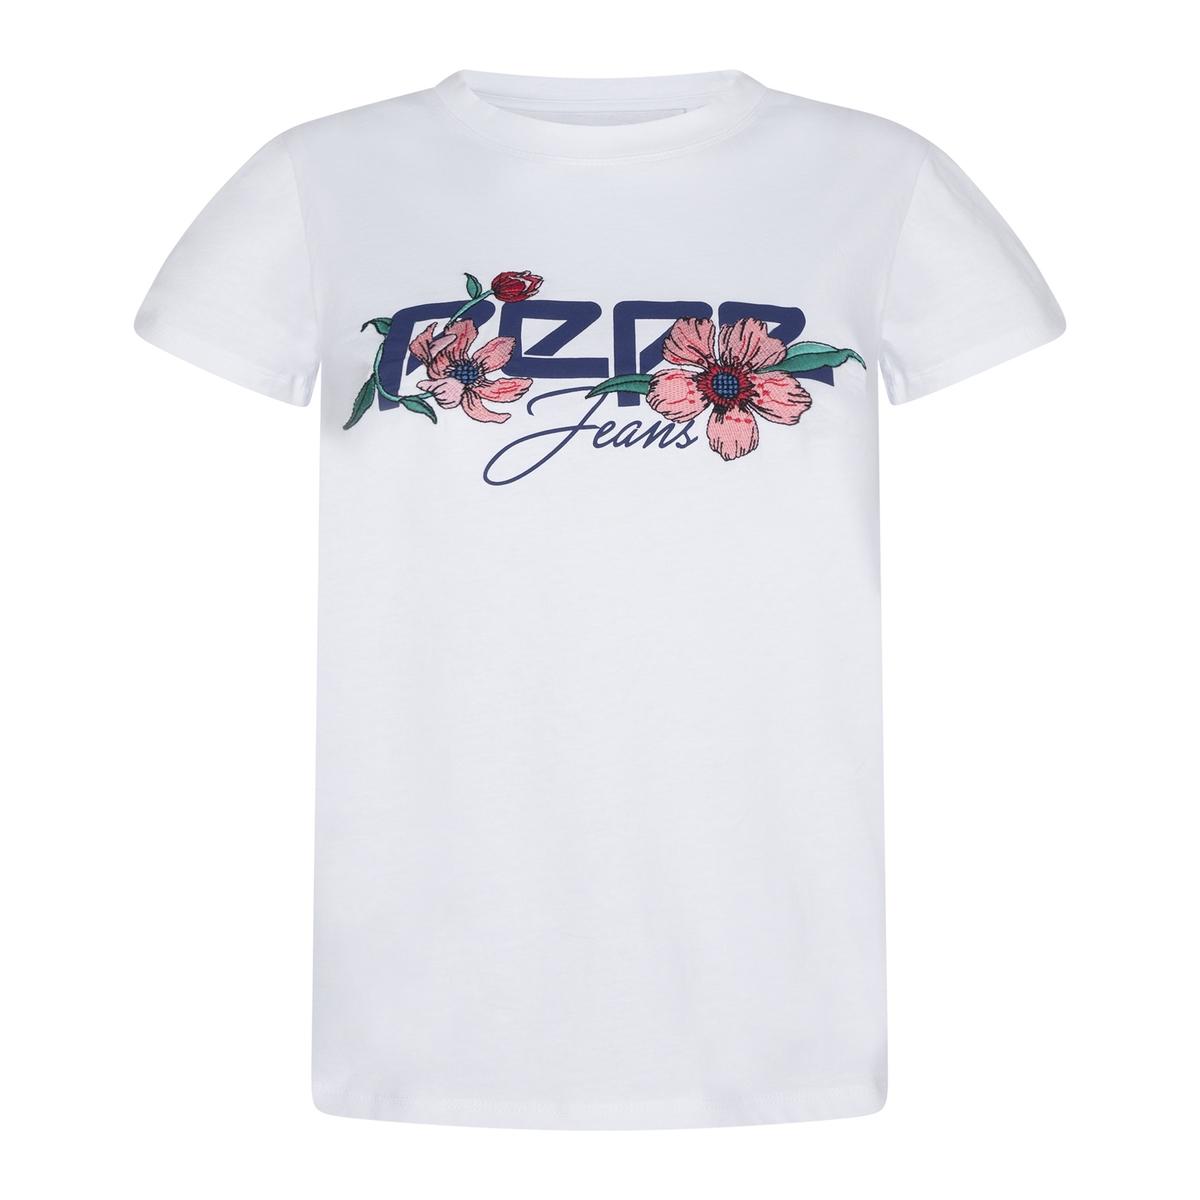 Camiseta con logotipo bordados Ailissa